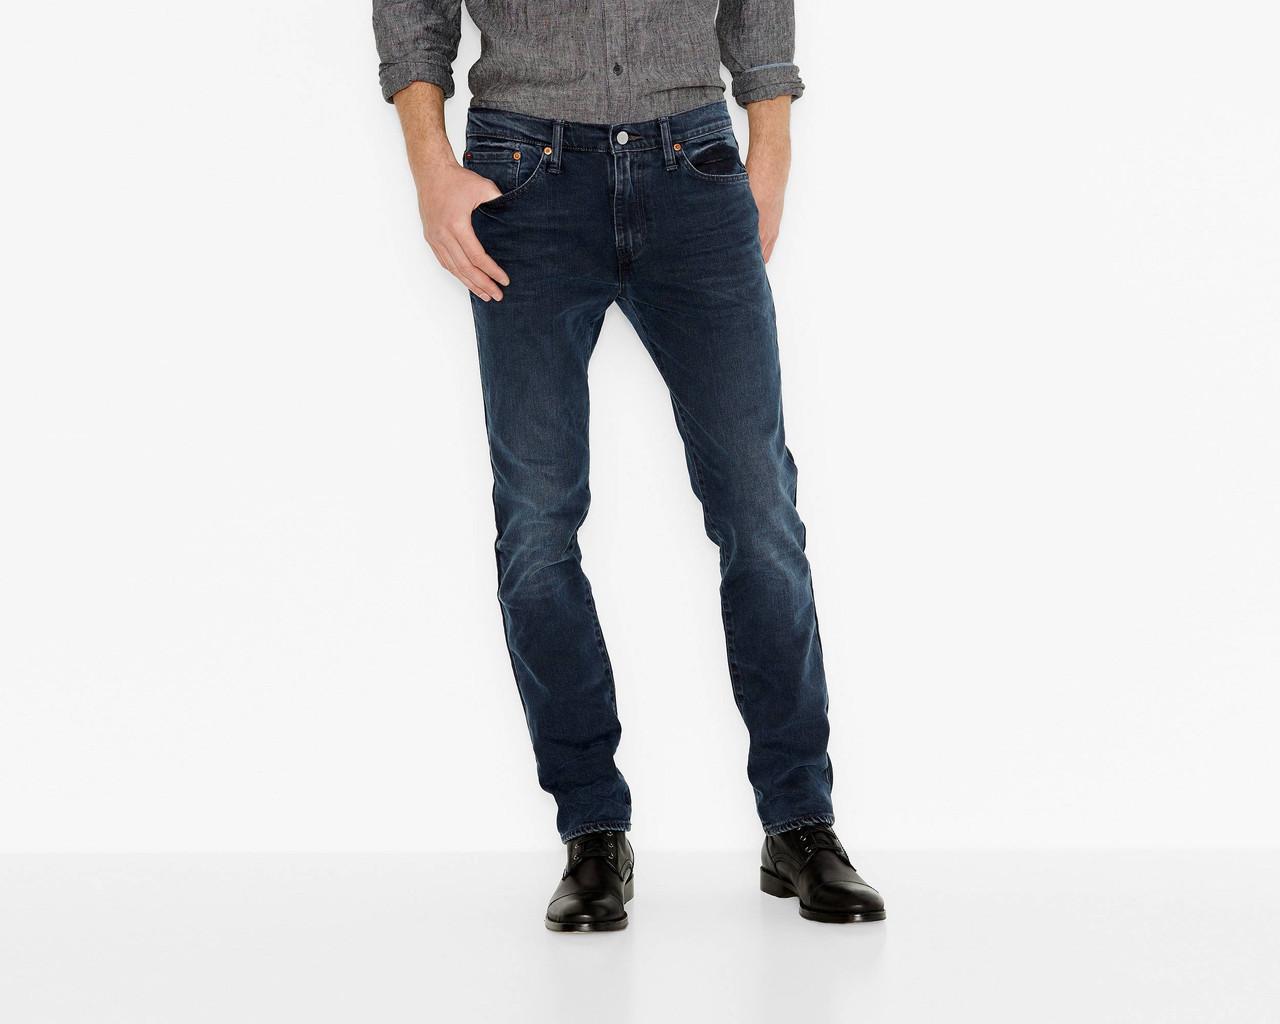 Джинсы Levi's 511 Slim Fit, Red Bluff, 38W30L, 045111771